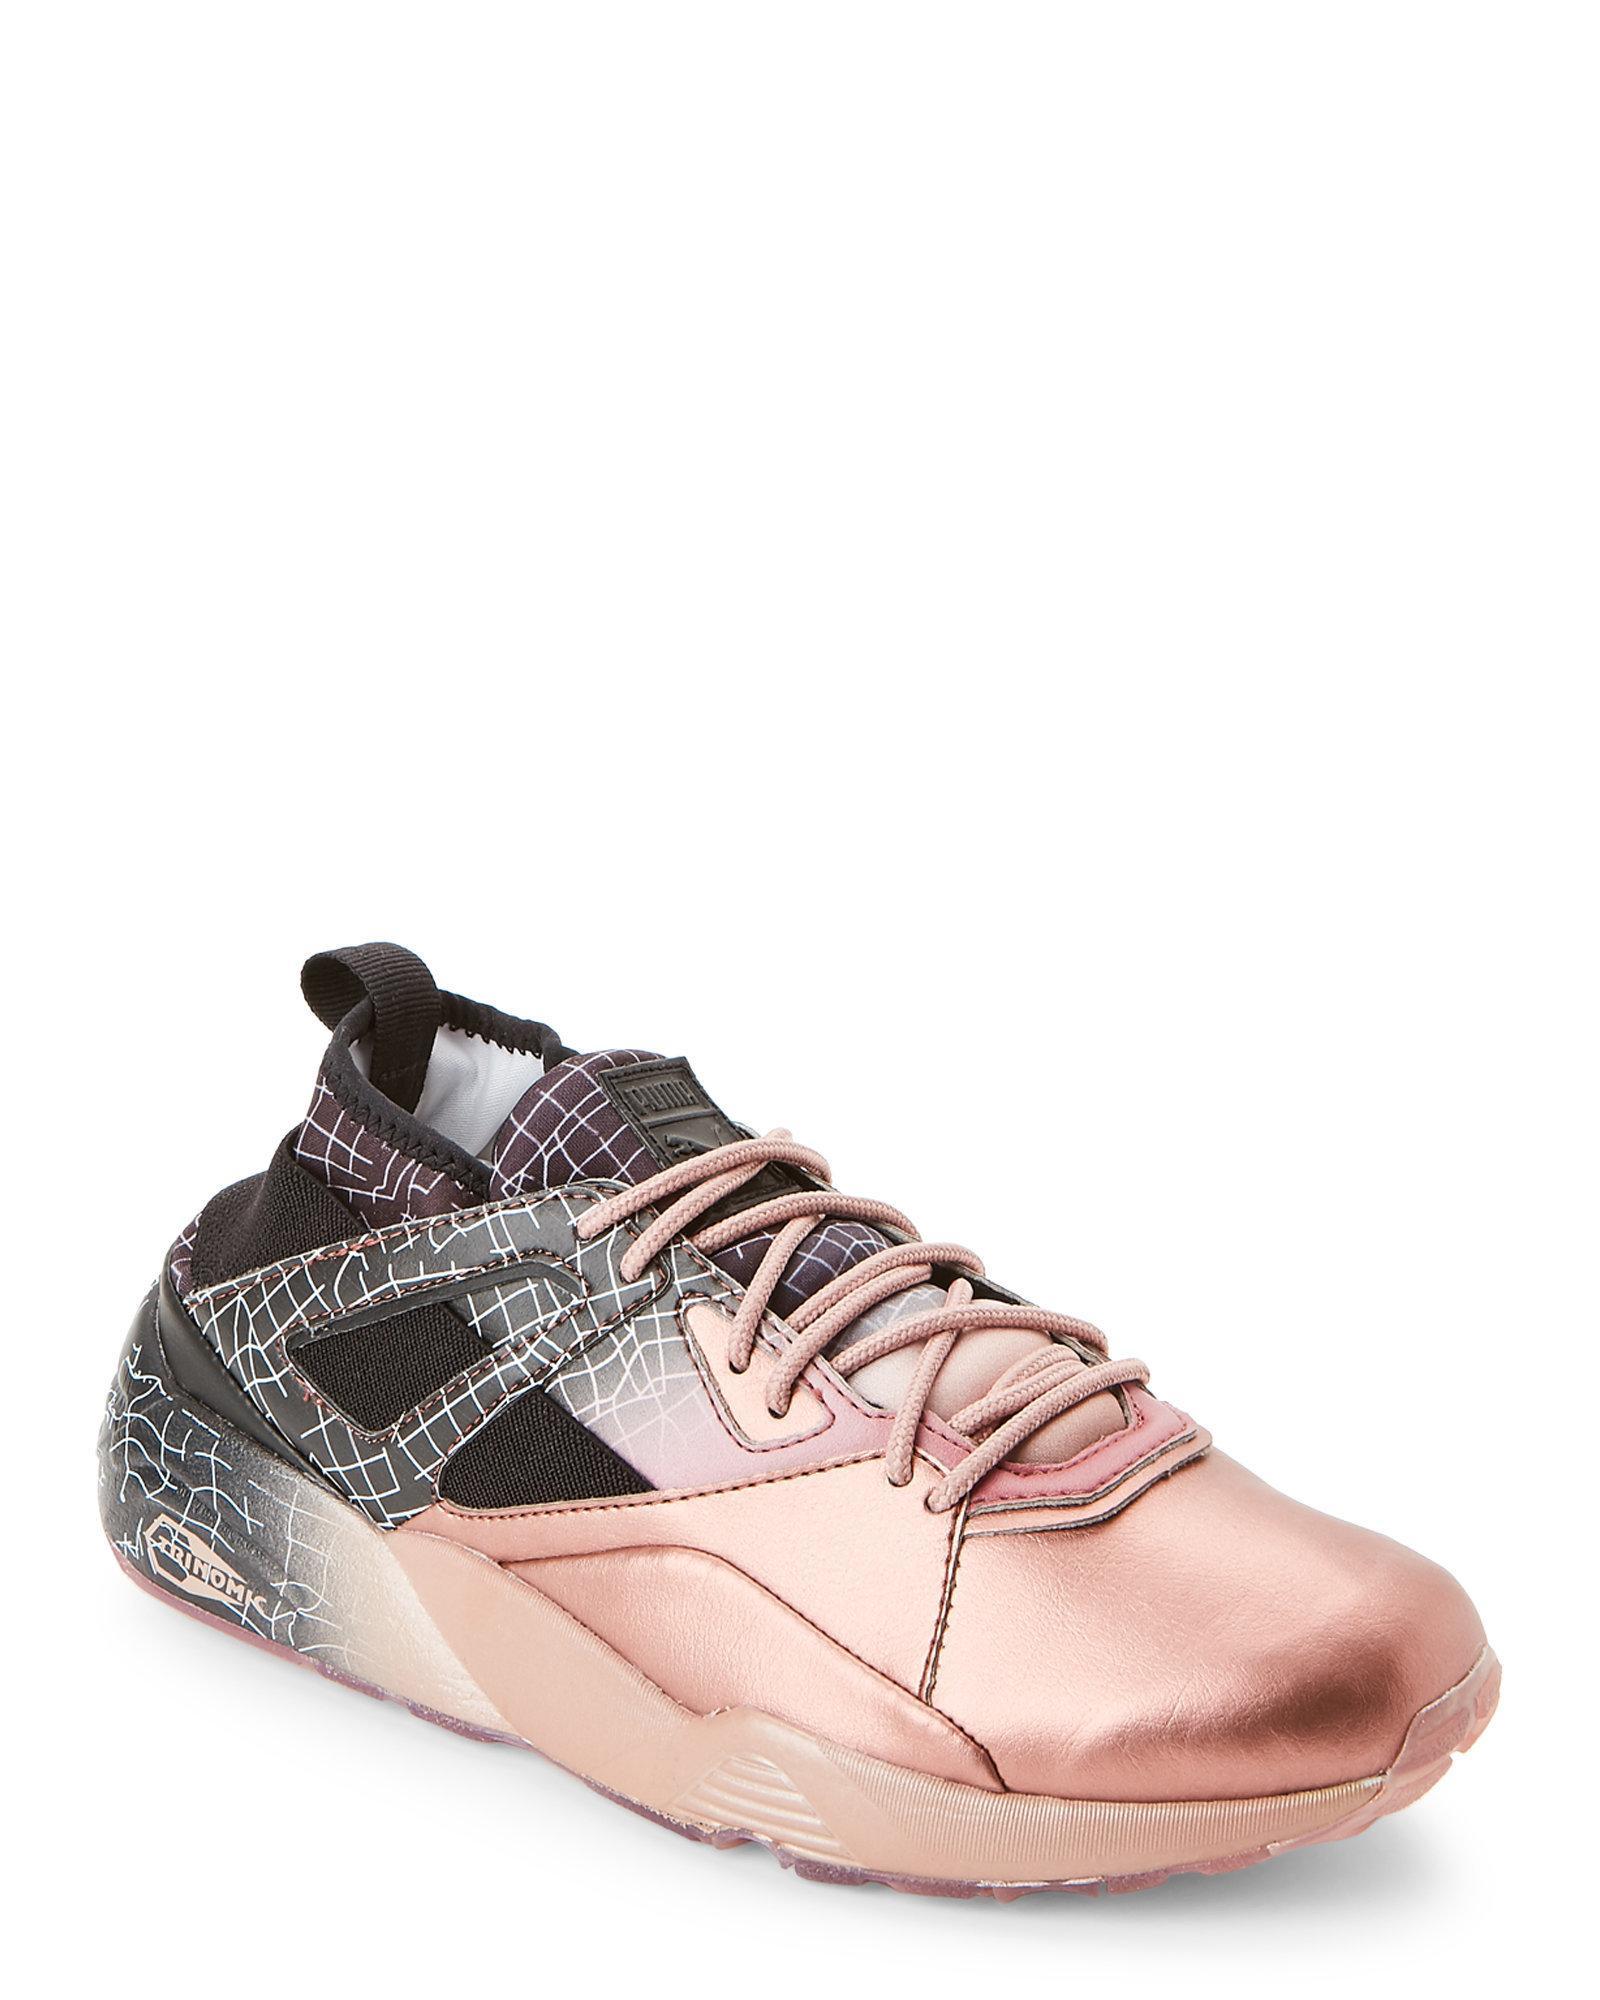 3e9b3883394728 ... clearance lyst puma rose gold black blaze of glory sock running sneaker  in 7a0d5 38bfc